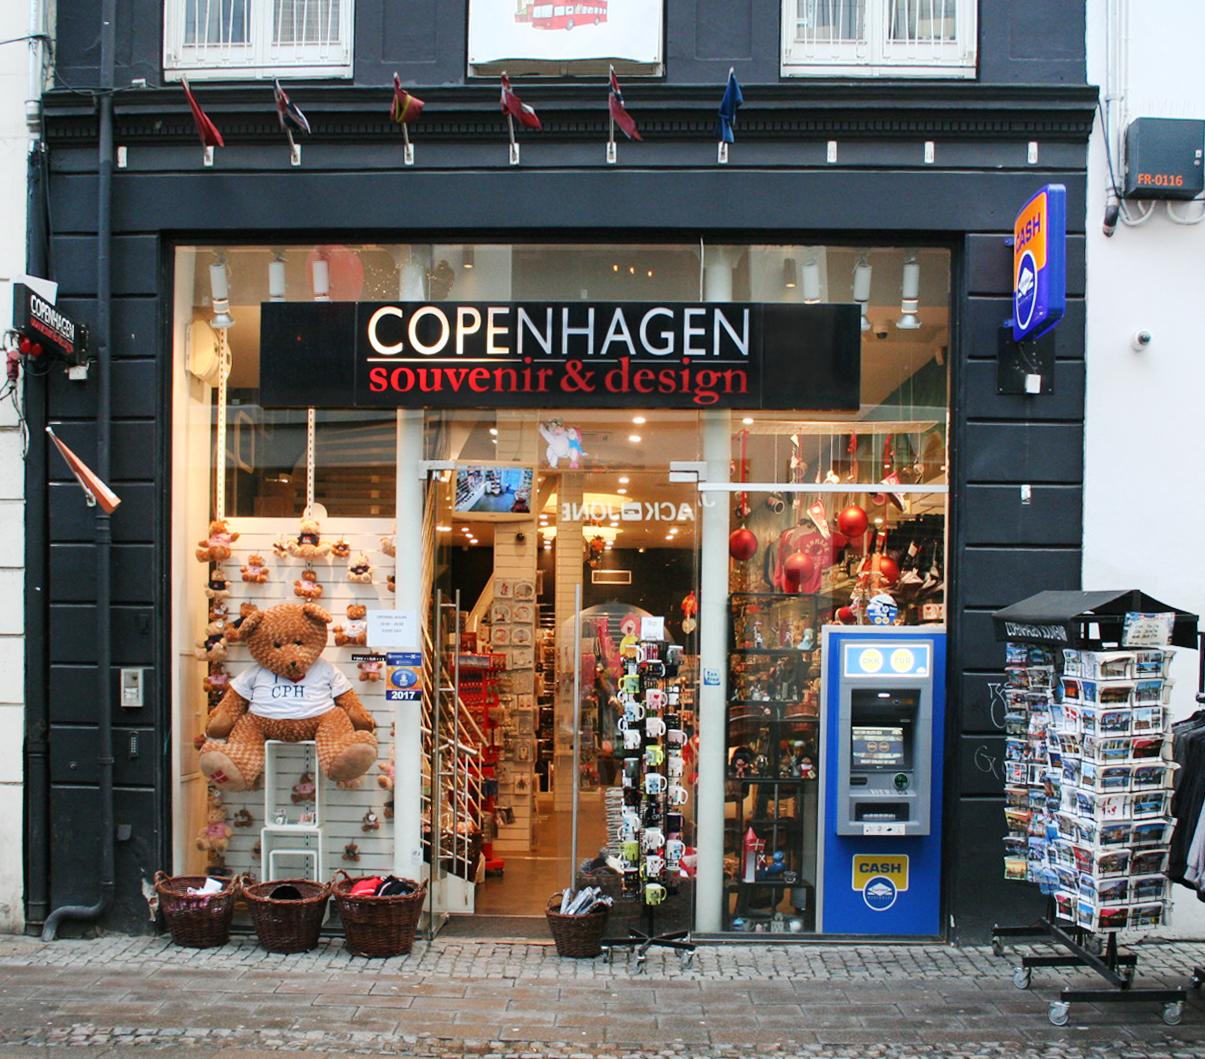 Frederiksberggrade 17